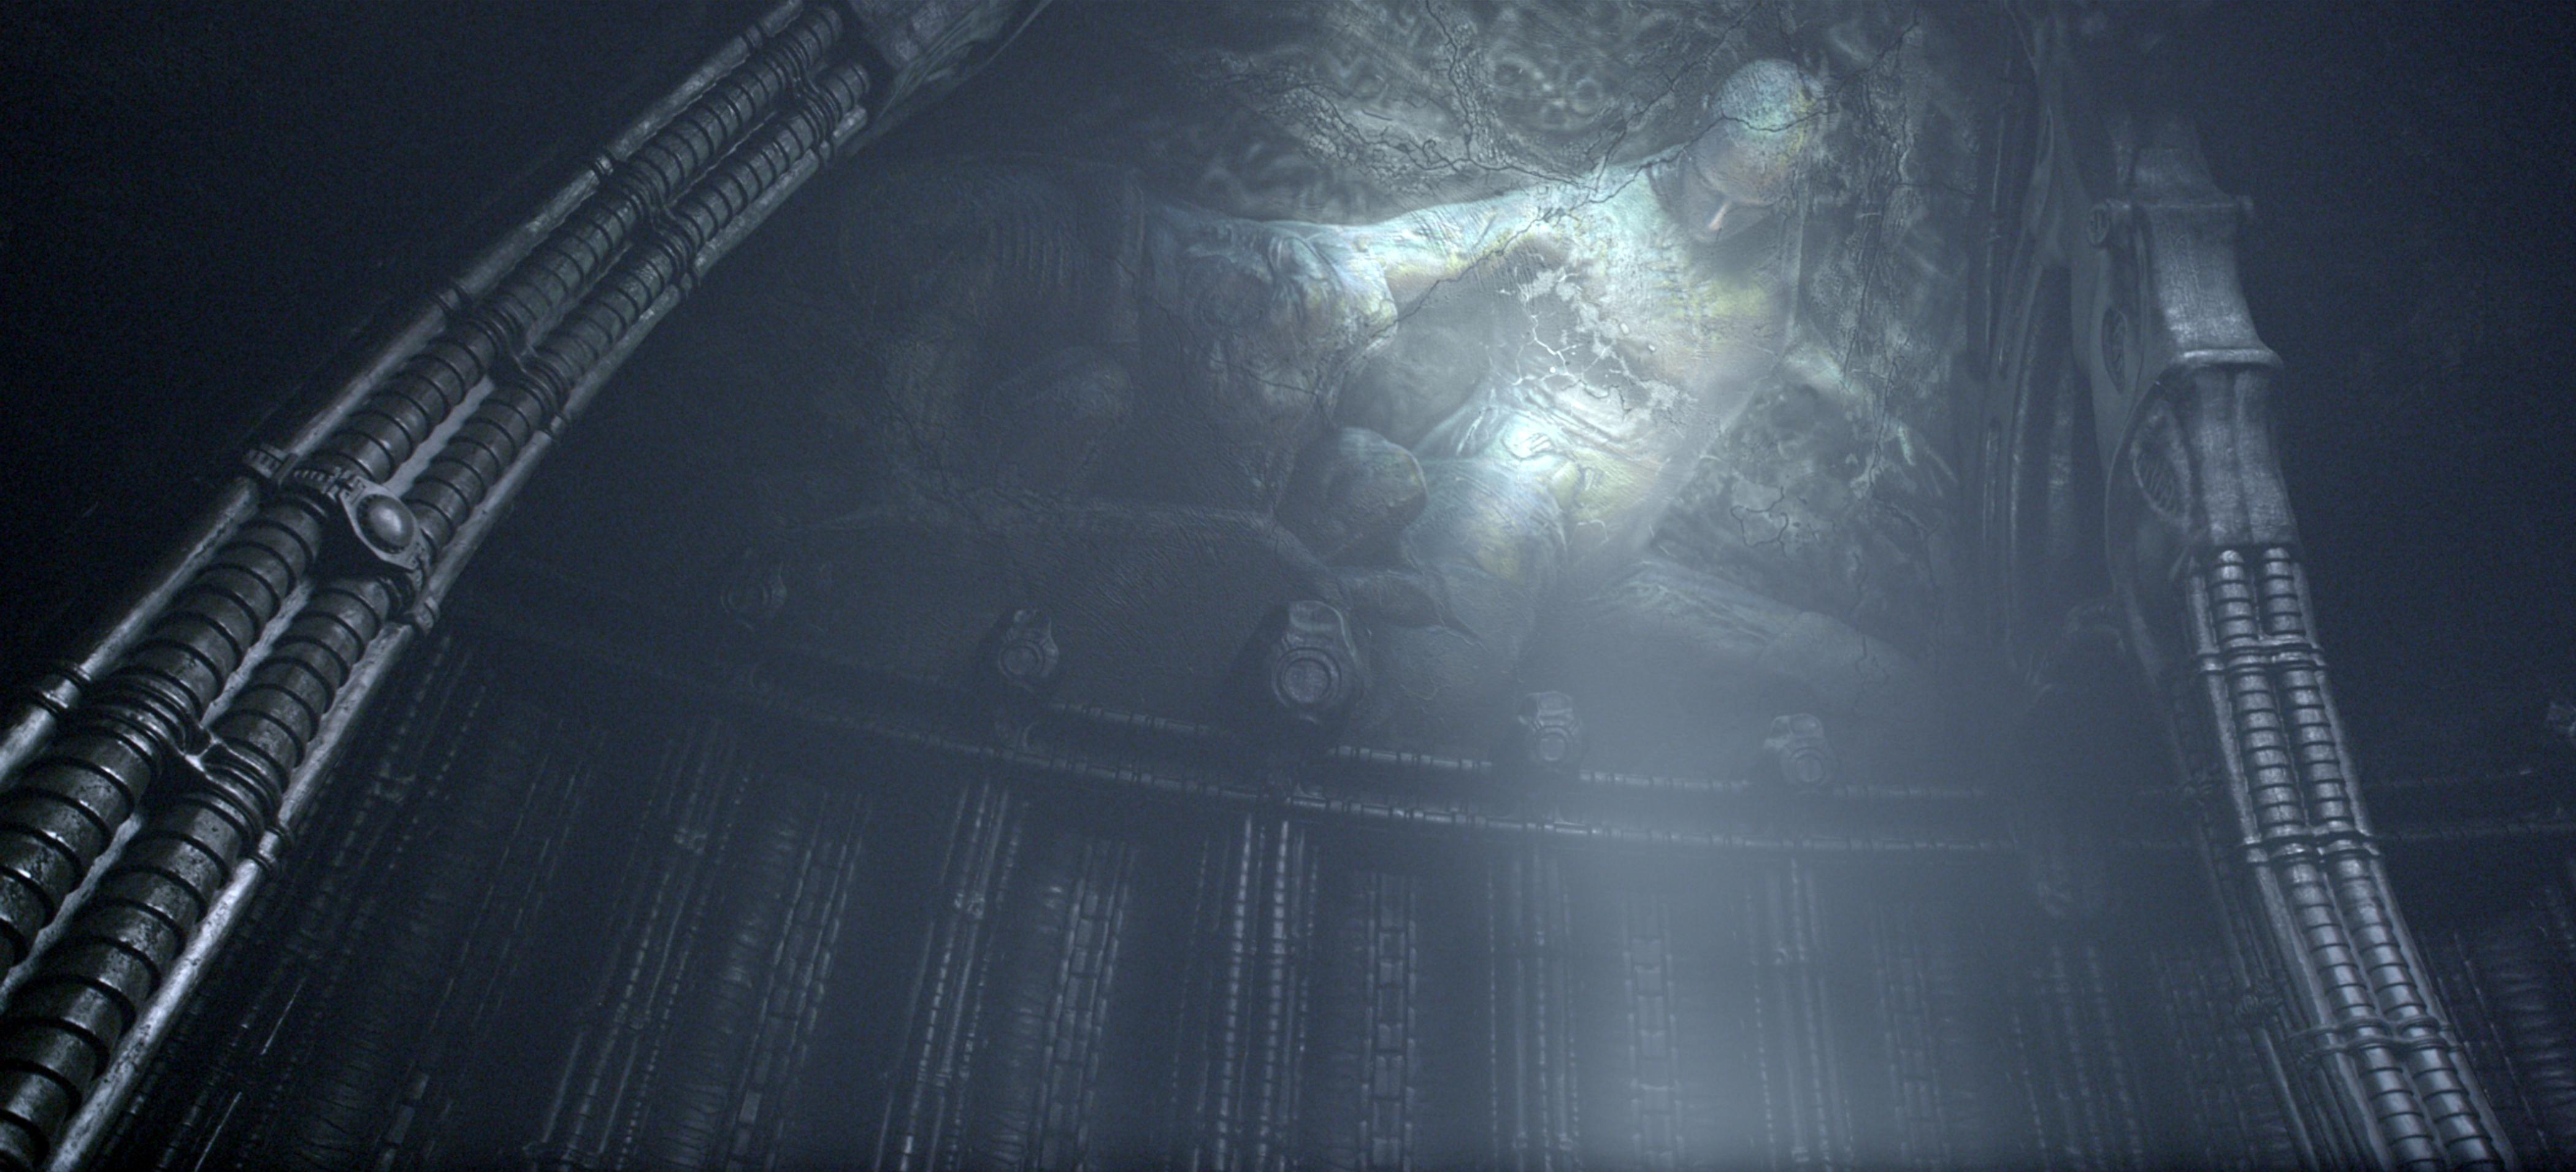 Prometheus ridley scott noomi rapace scifiempire for Prometheus xenomorph mural